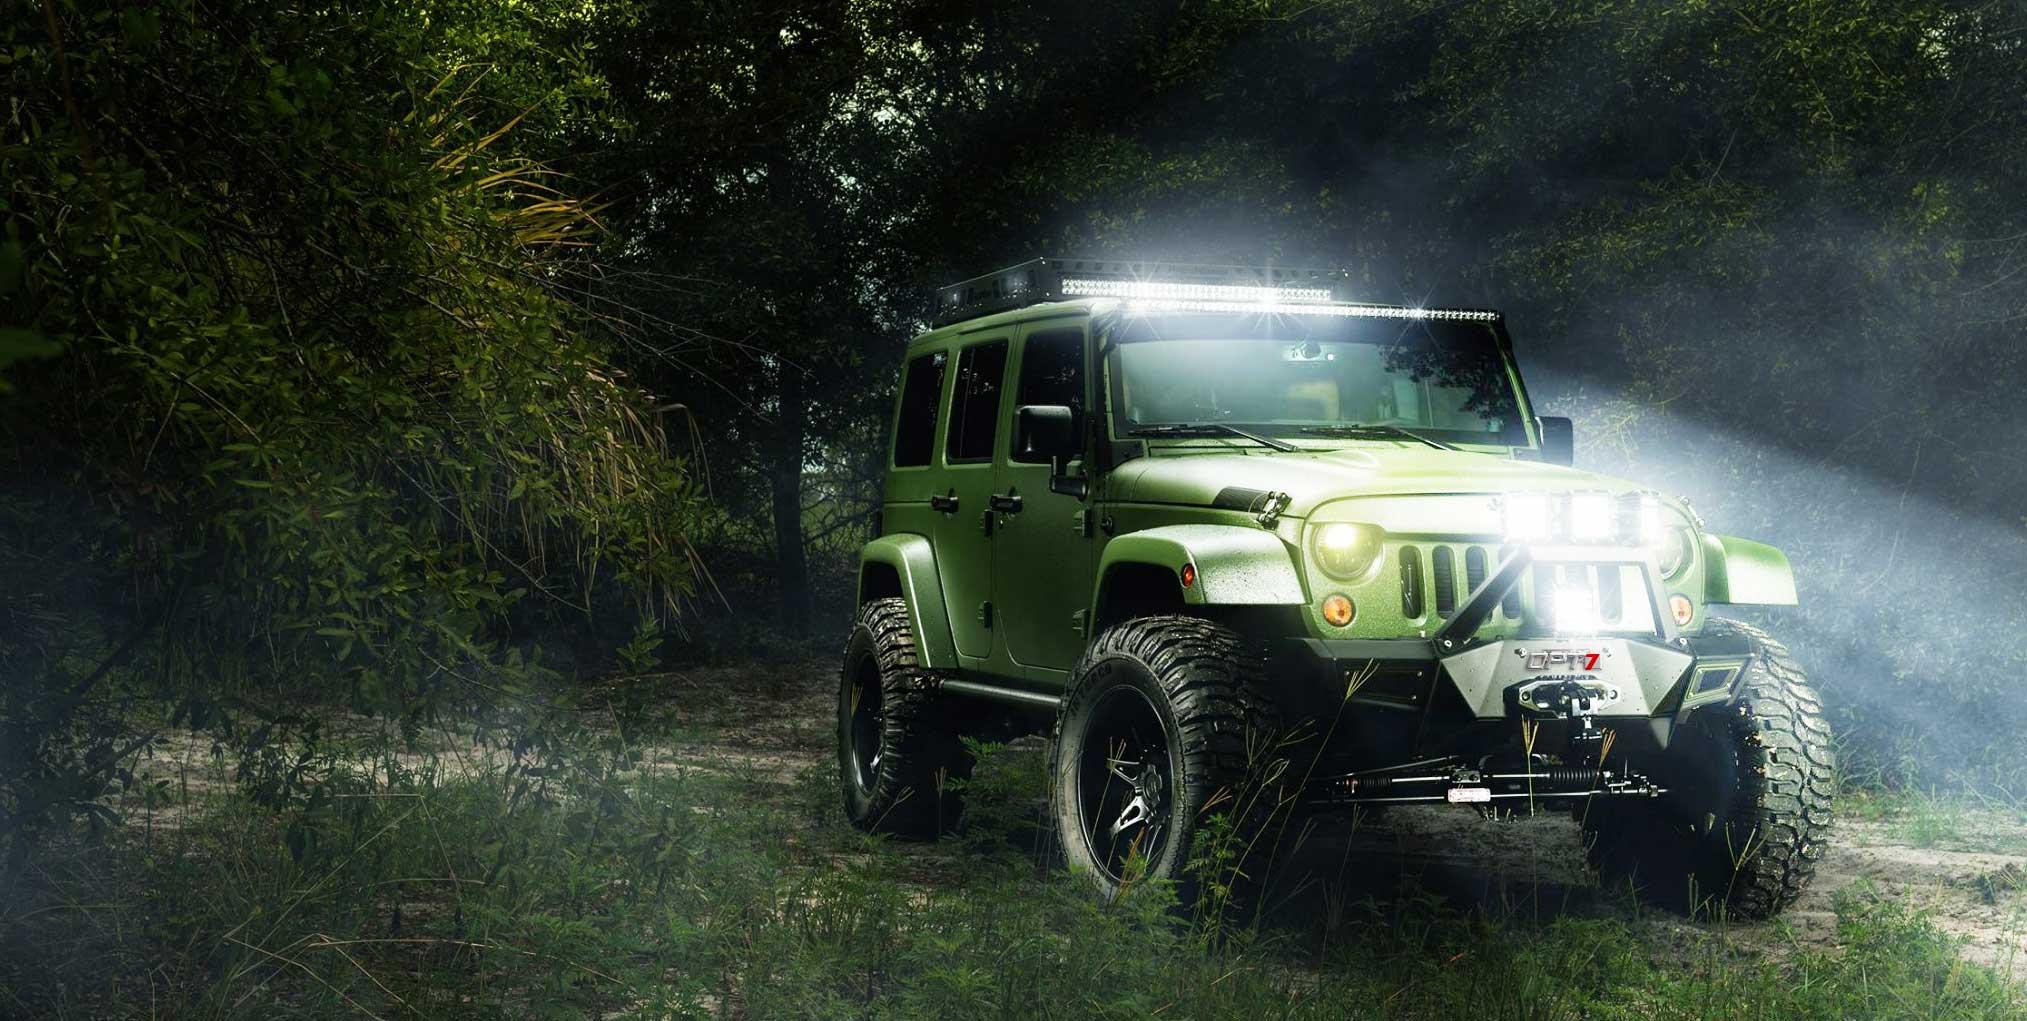 off-road lights off road LED lights on & OPT7 - LED u0026 HID Lighting for Cars Trucks u0026 Motorcycles azcodes.com